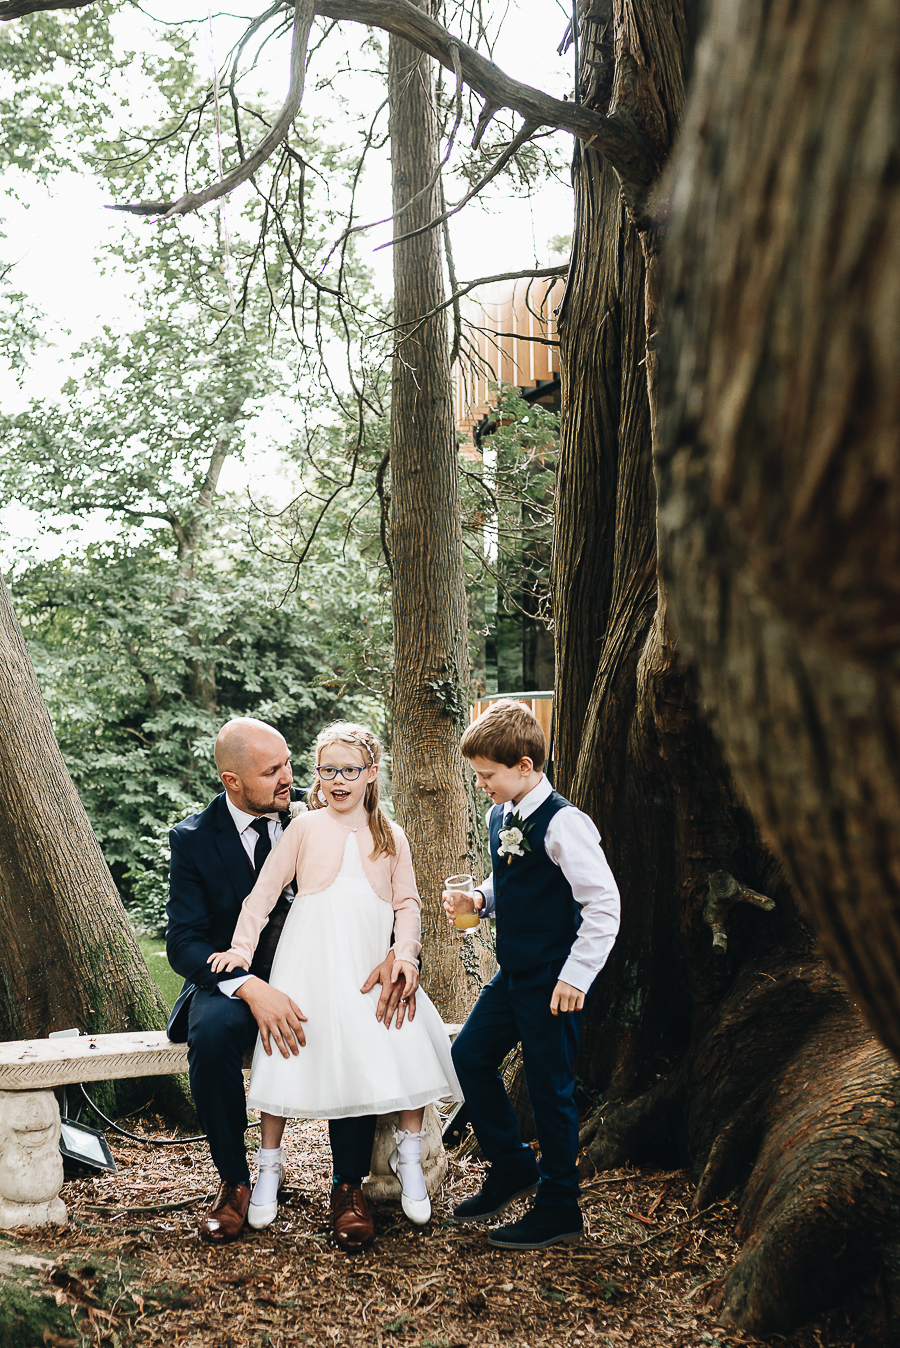 OurBeautifulAdventure-FairyhillWedding-John&Zoe-WeddingBlog-1973.jpg